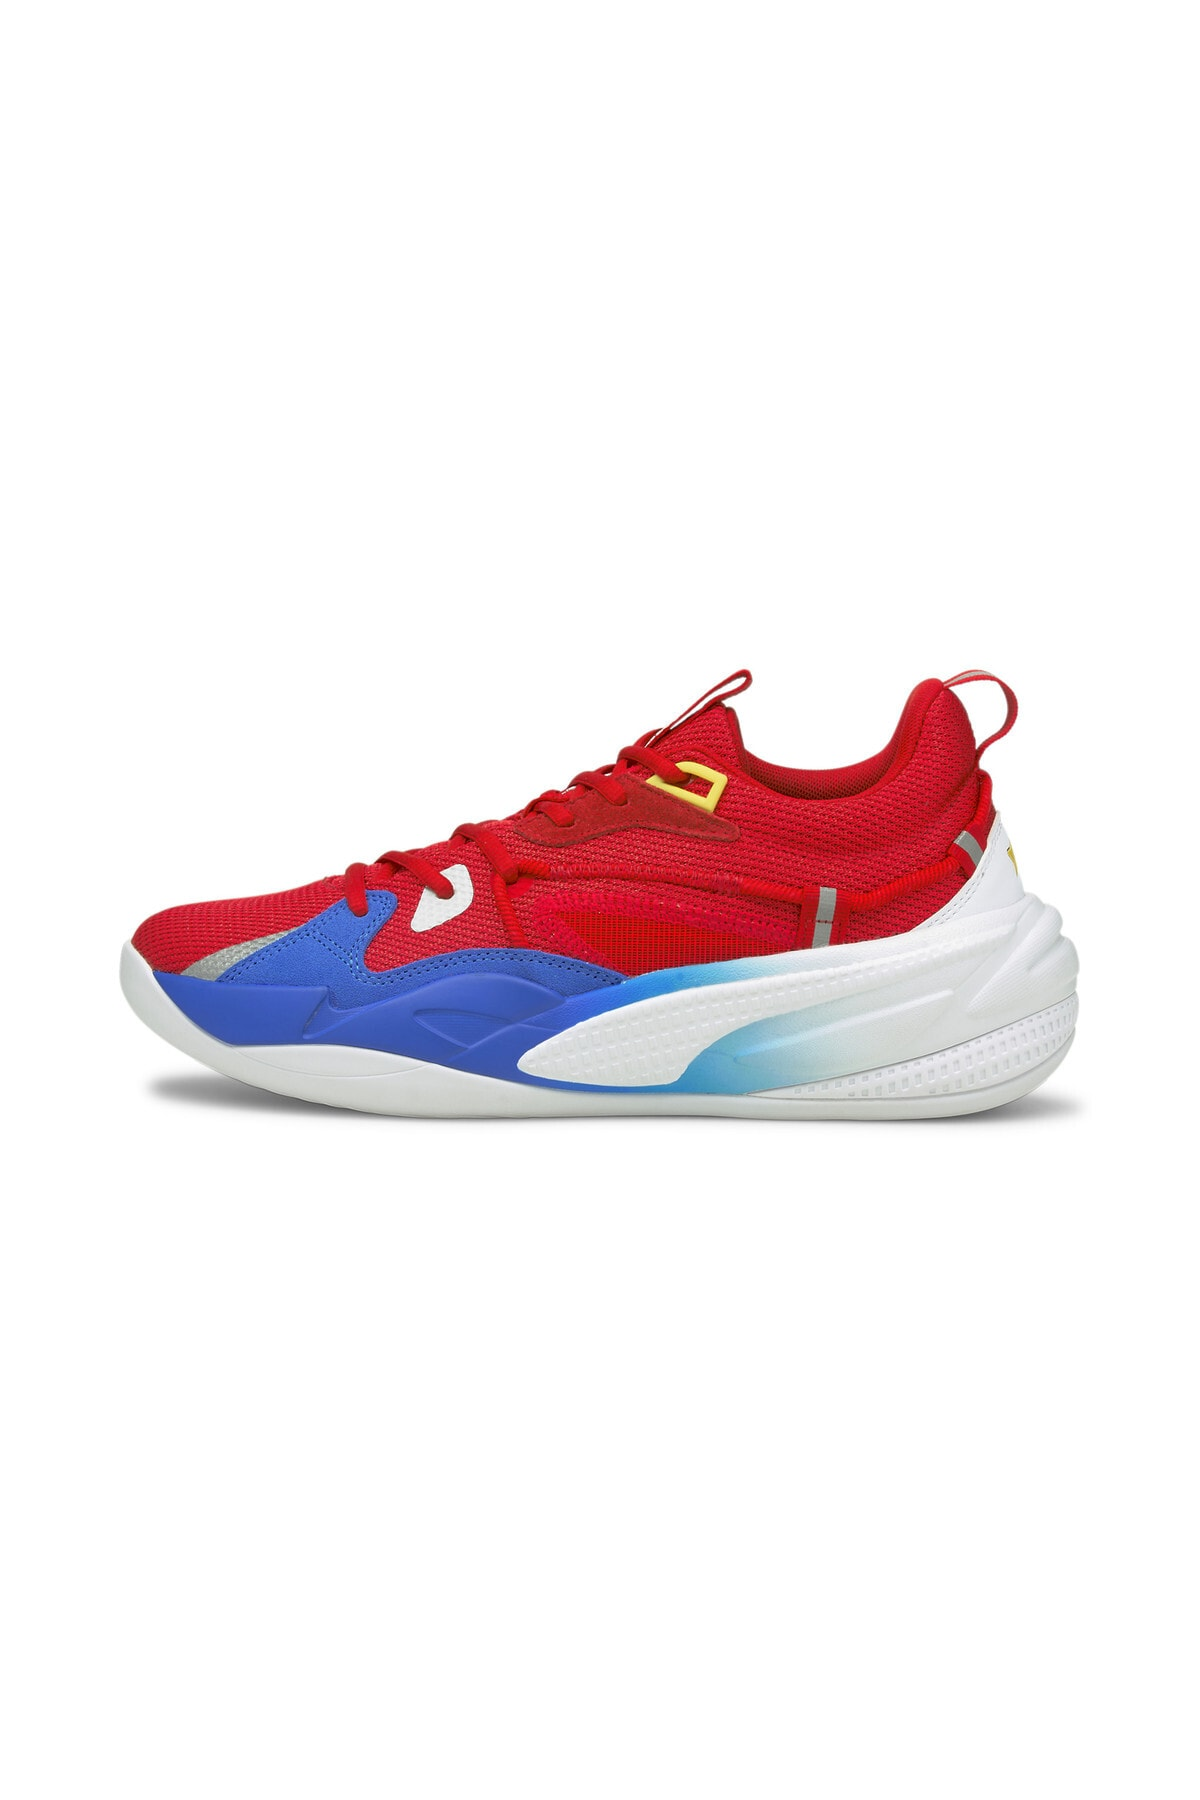 Puma RS-Dreamer SUPER MARIO 64™ JR Basketbol Ayakkabı